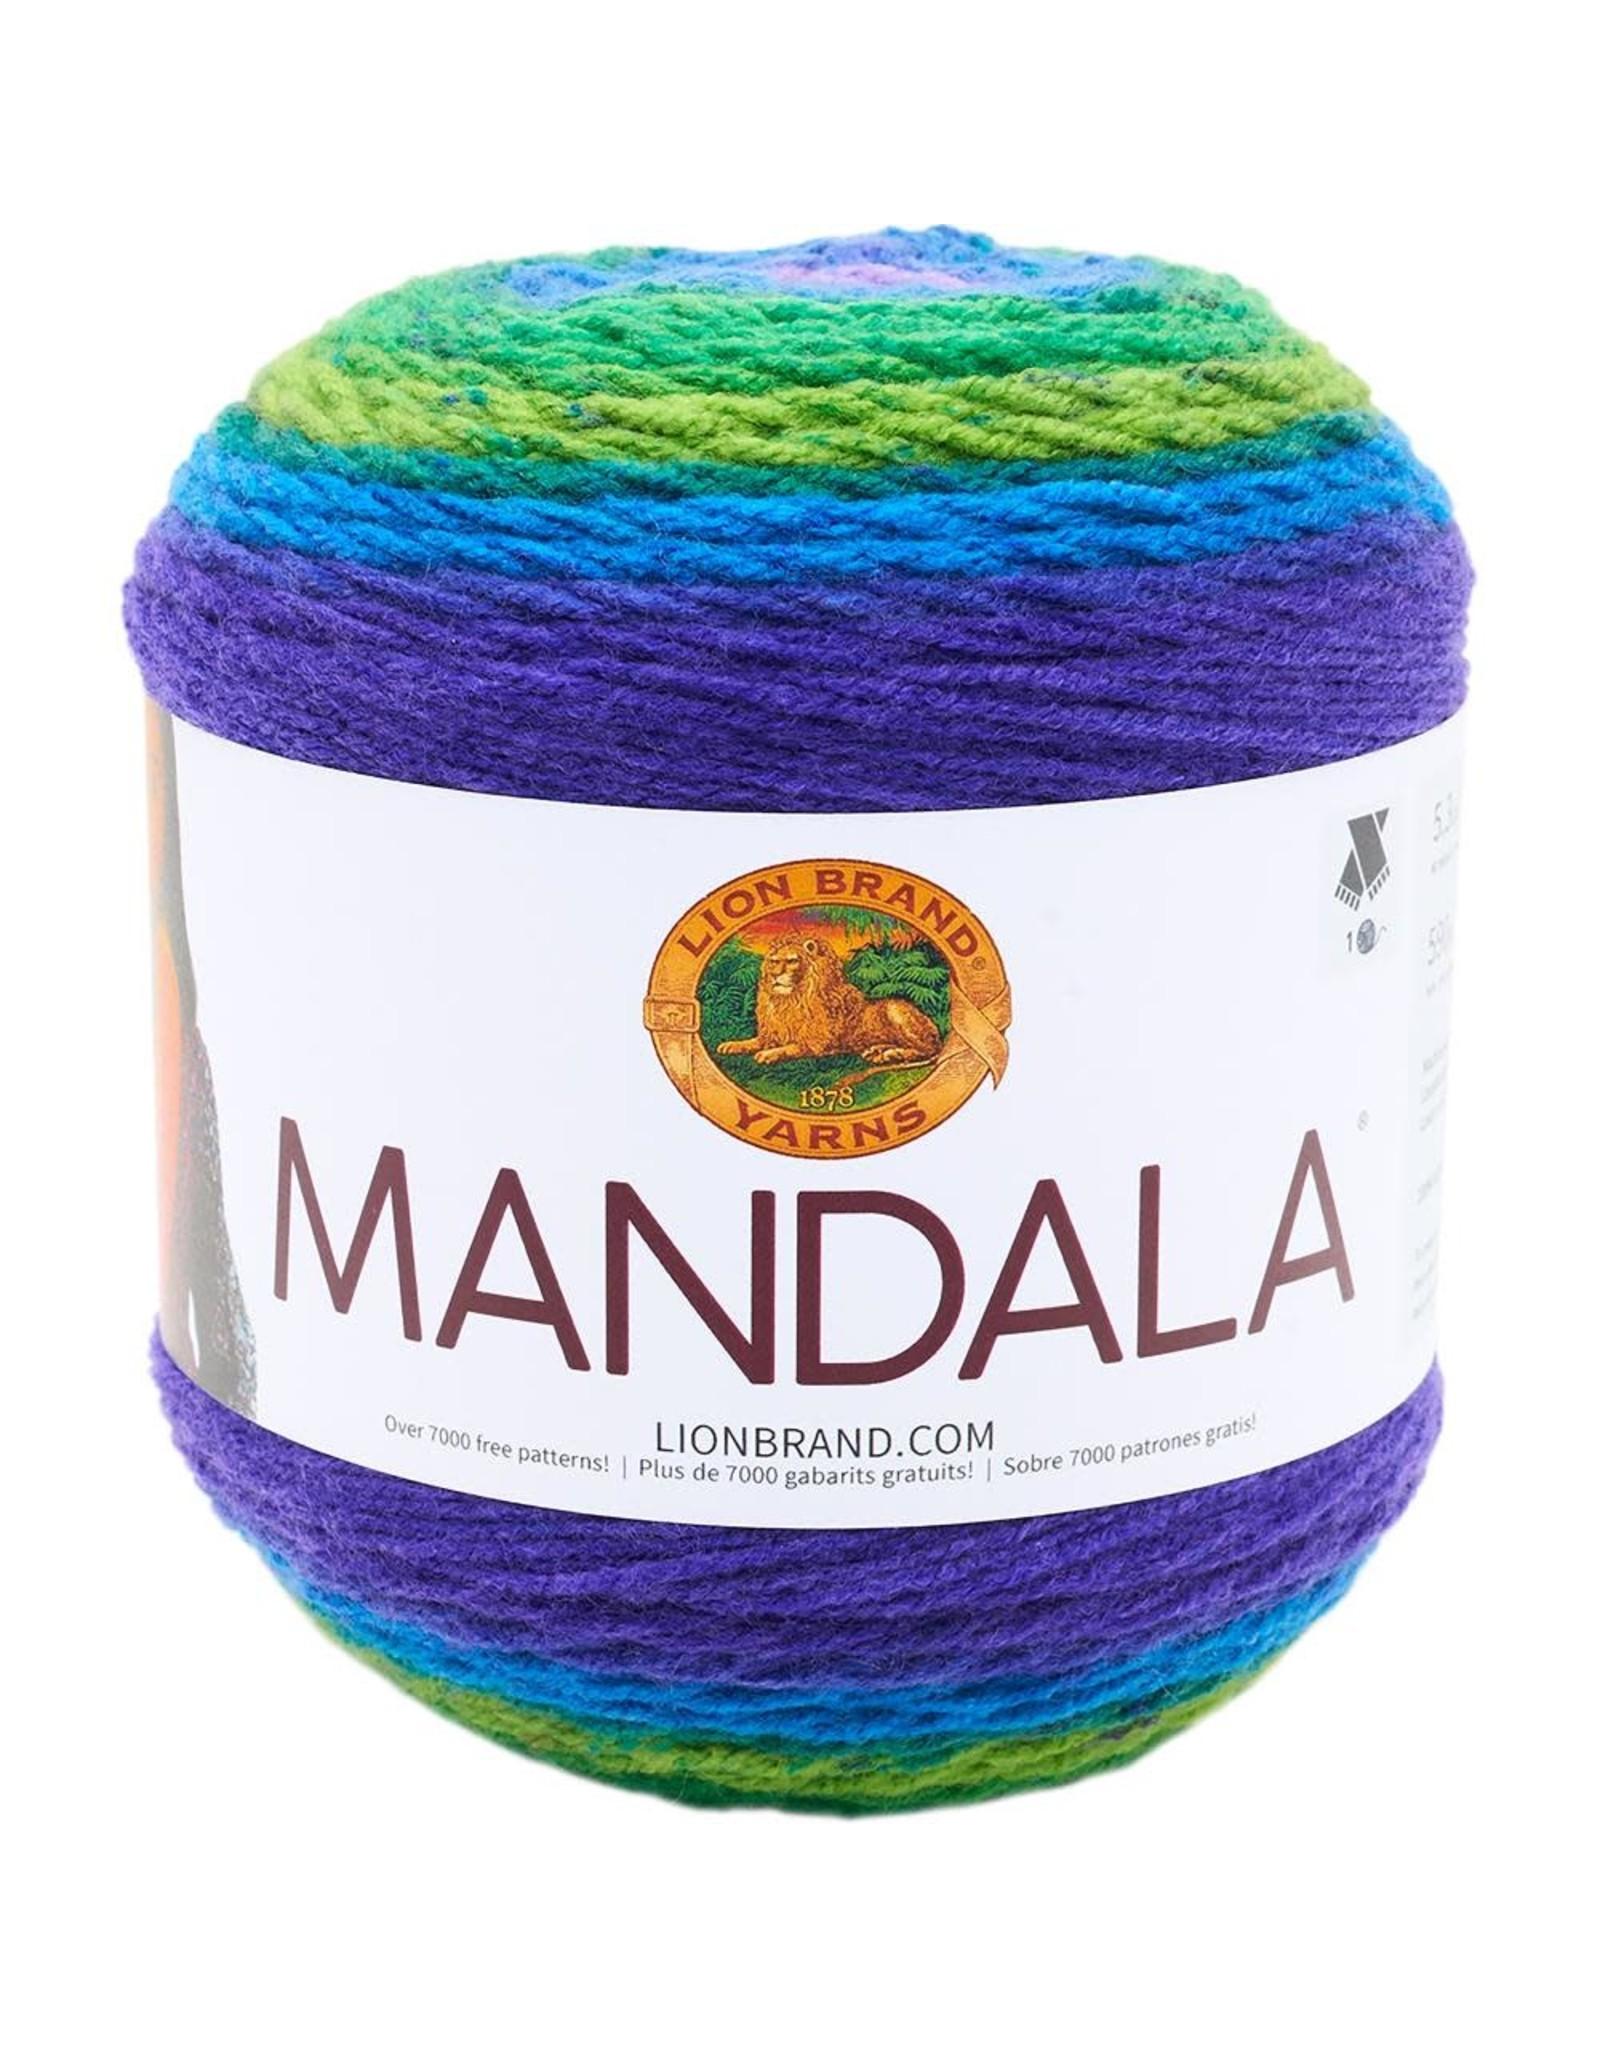 Wizard- Mandala - Lion Brand